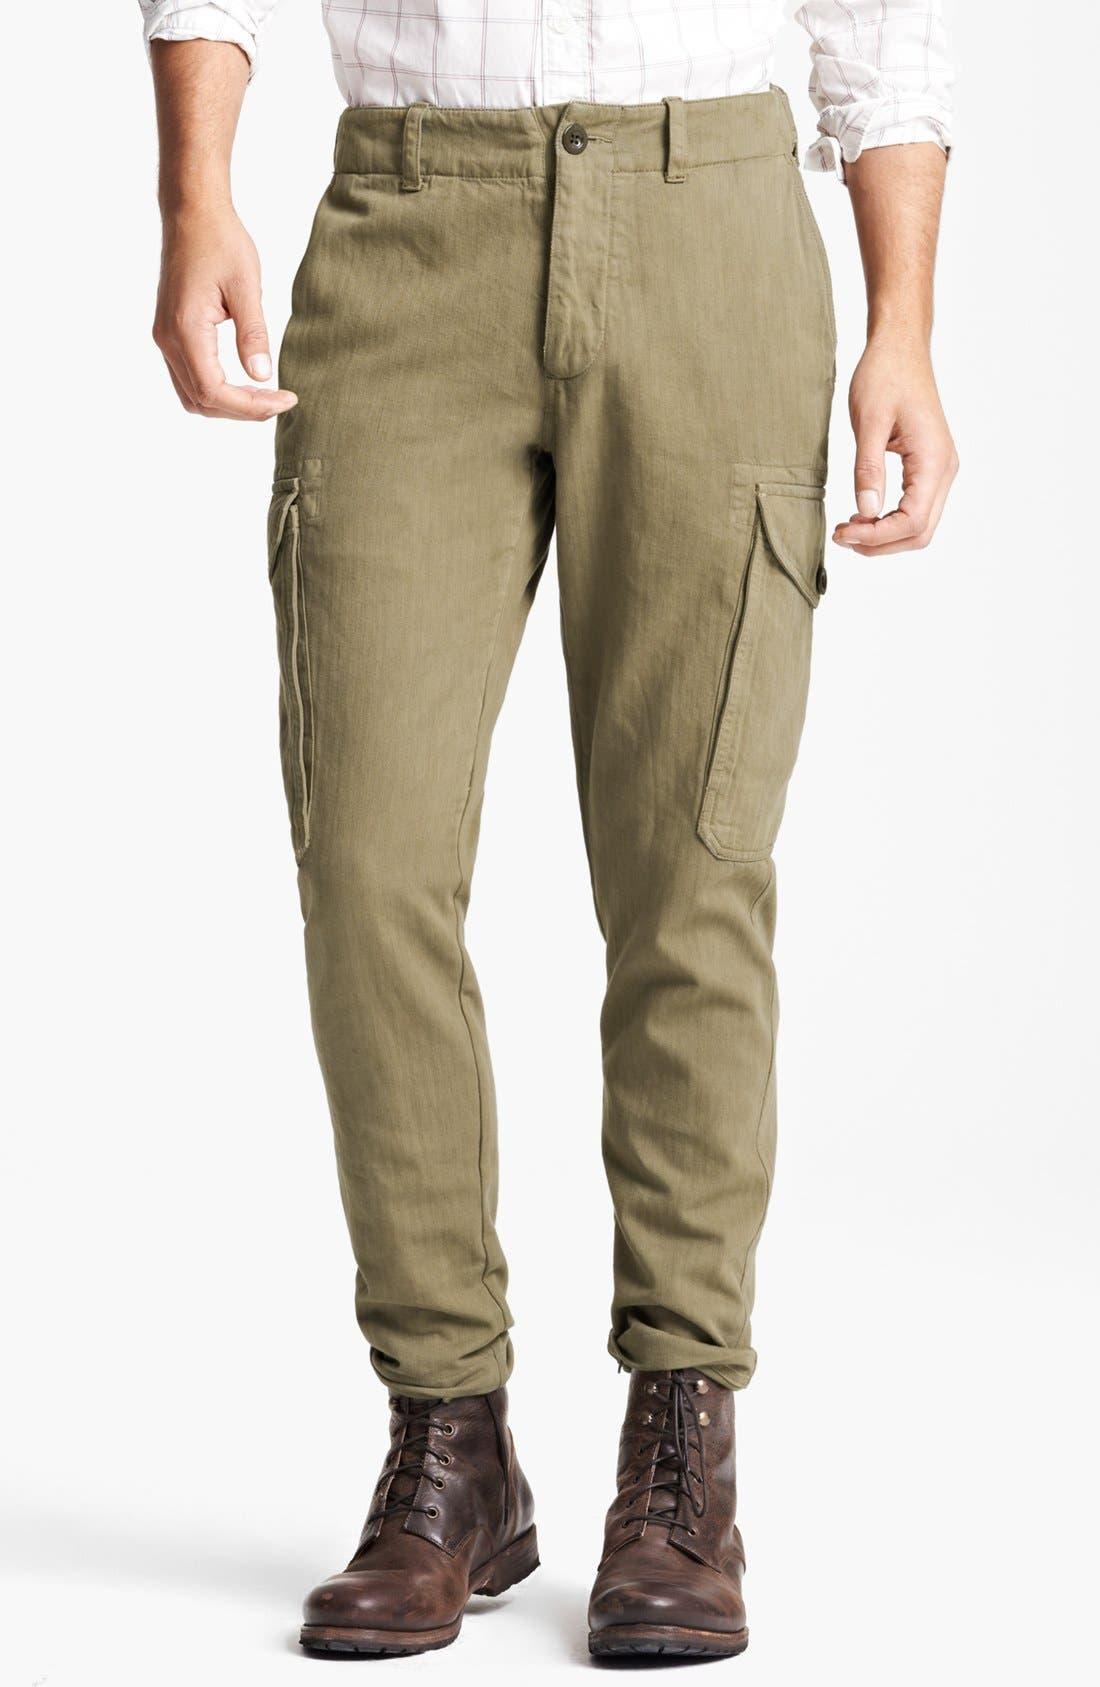 Main Image - Todd Snyder 'Infantry' Herringbone Cargo Pants